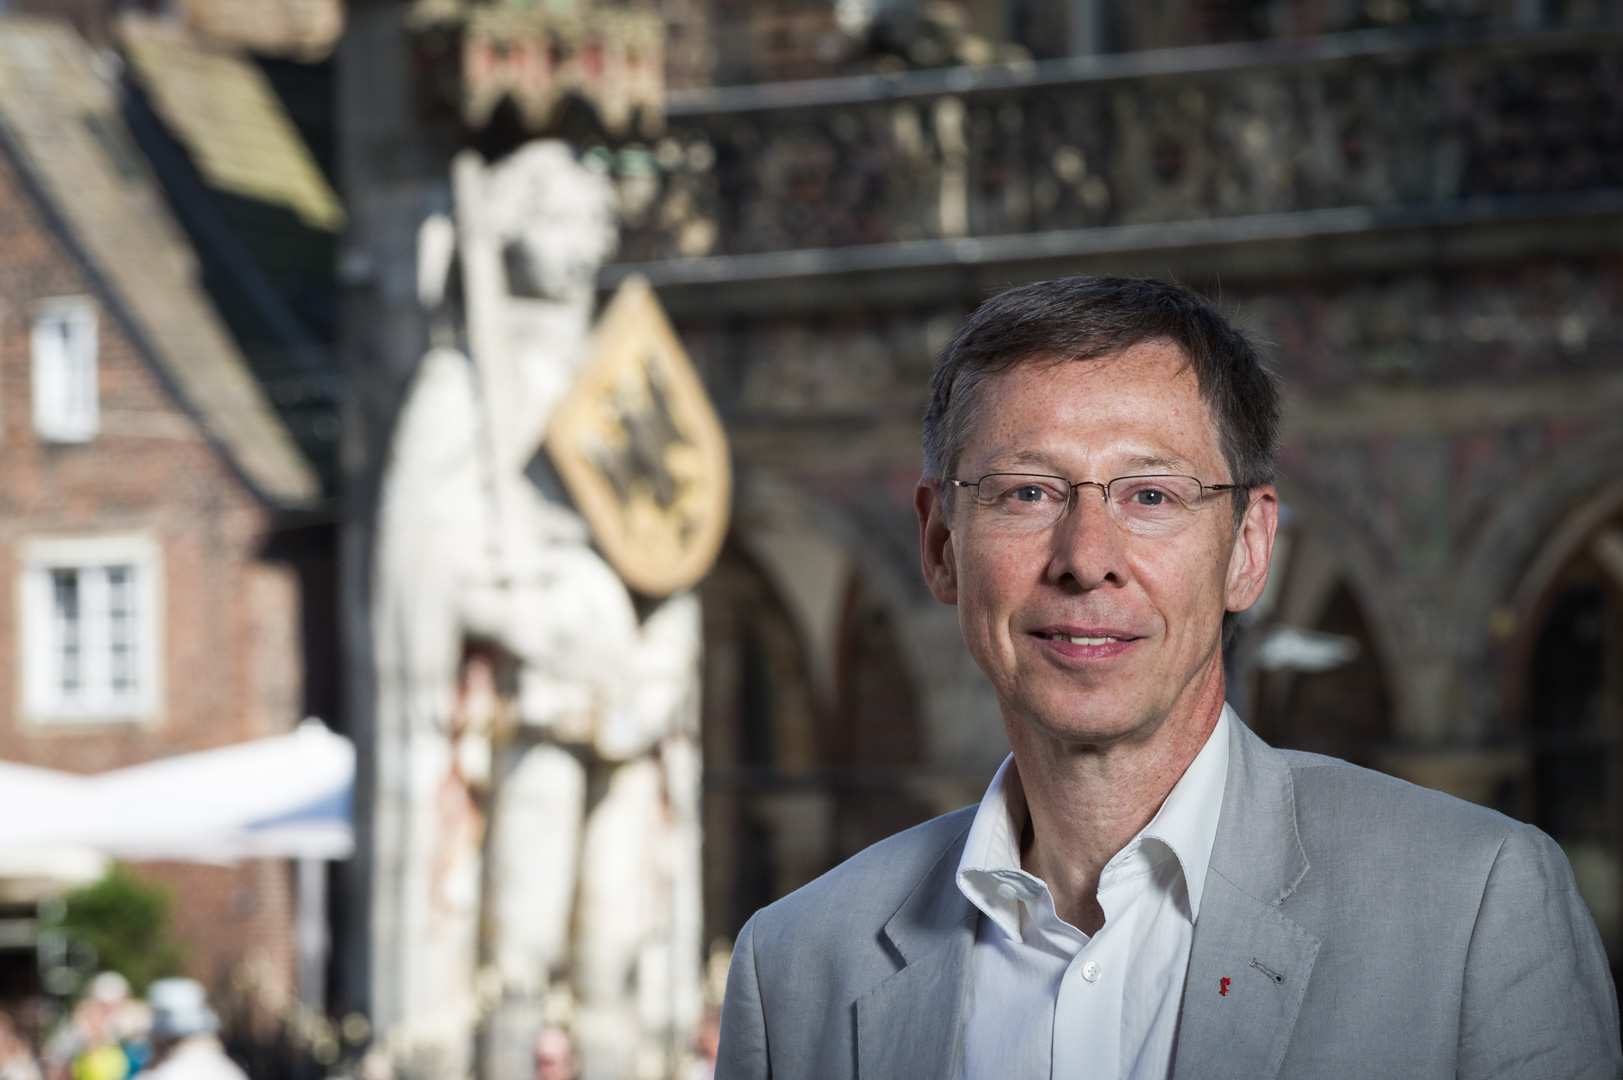 Der Bremer Bürgermeister Carsten Sieling